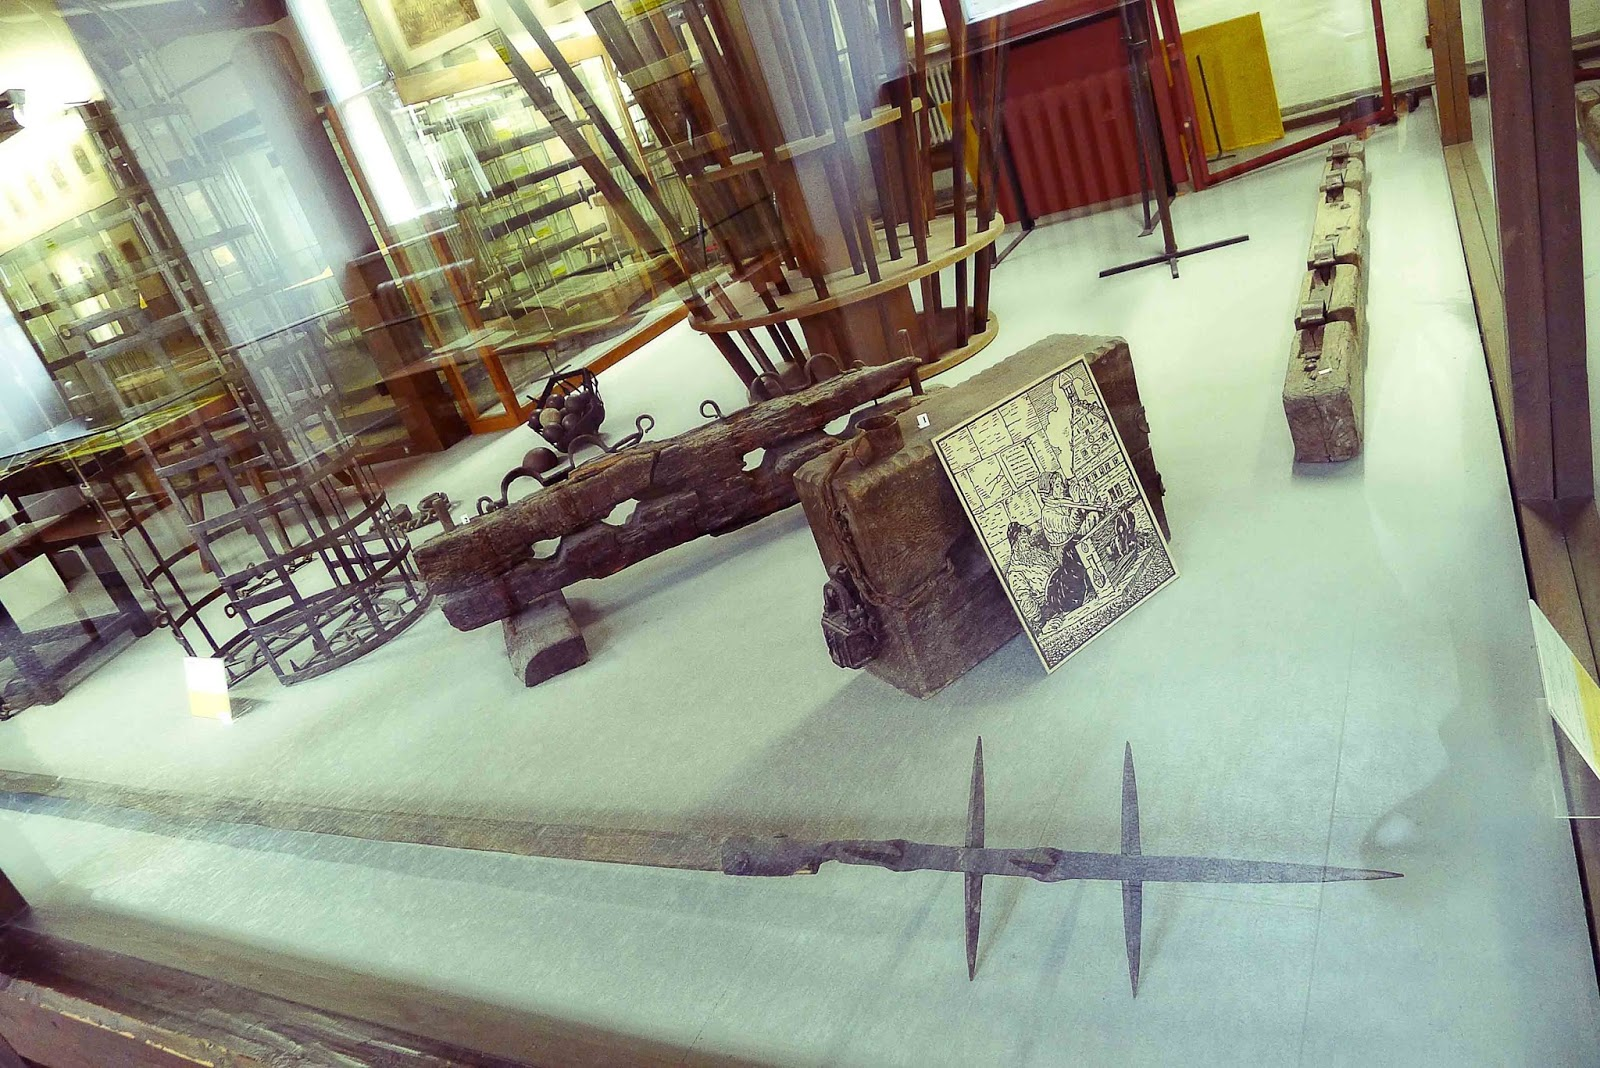 medieval crime and punishment musuem